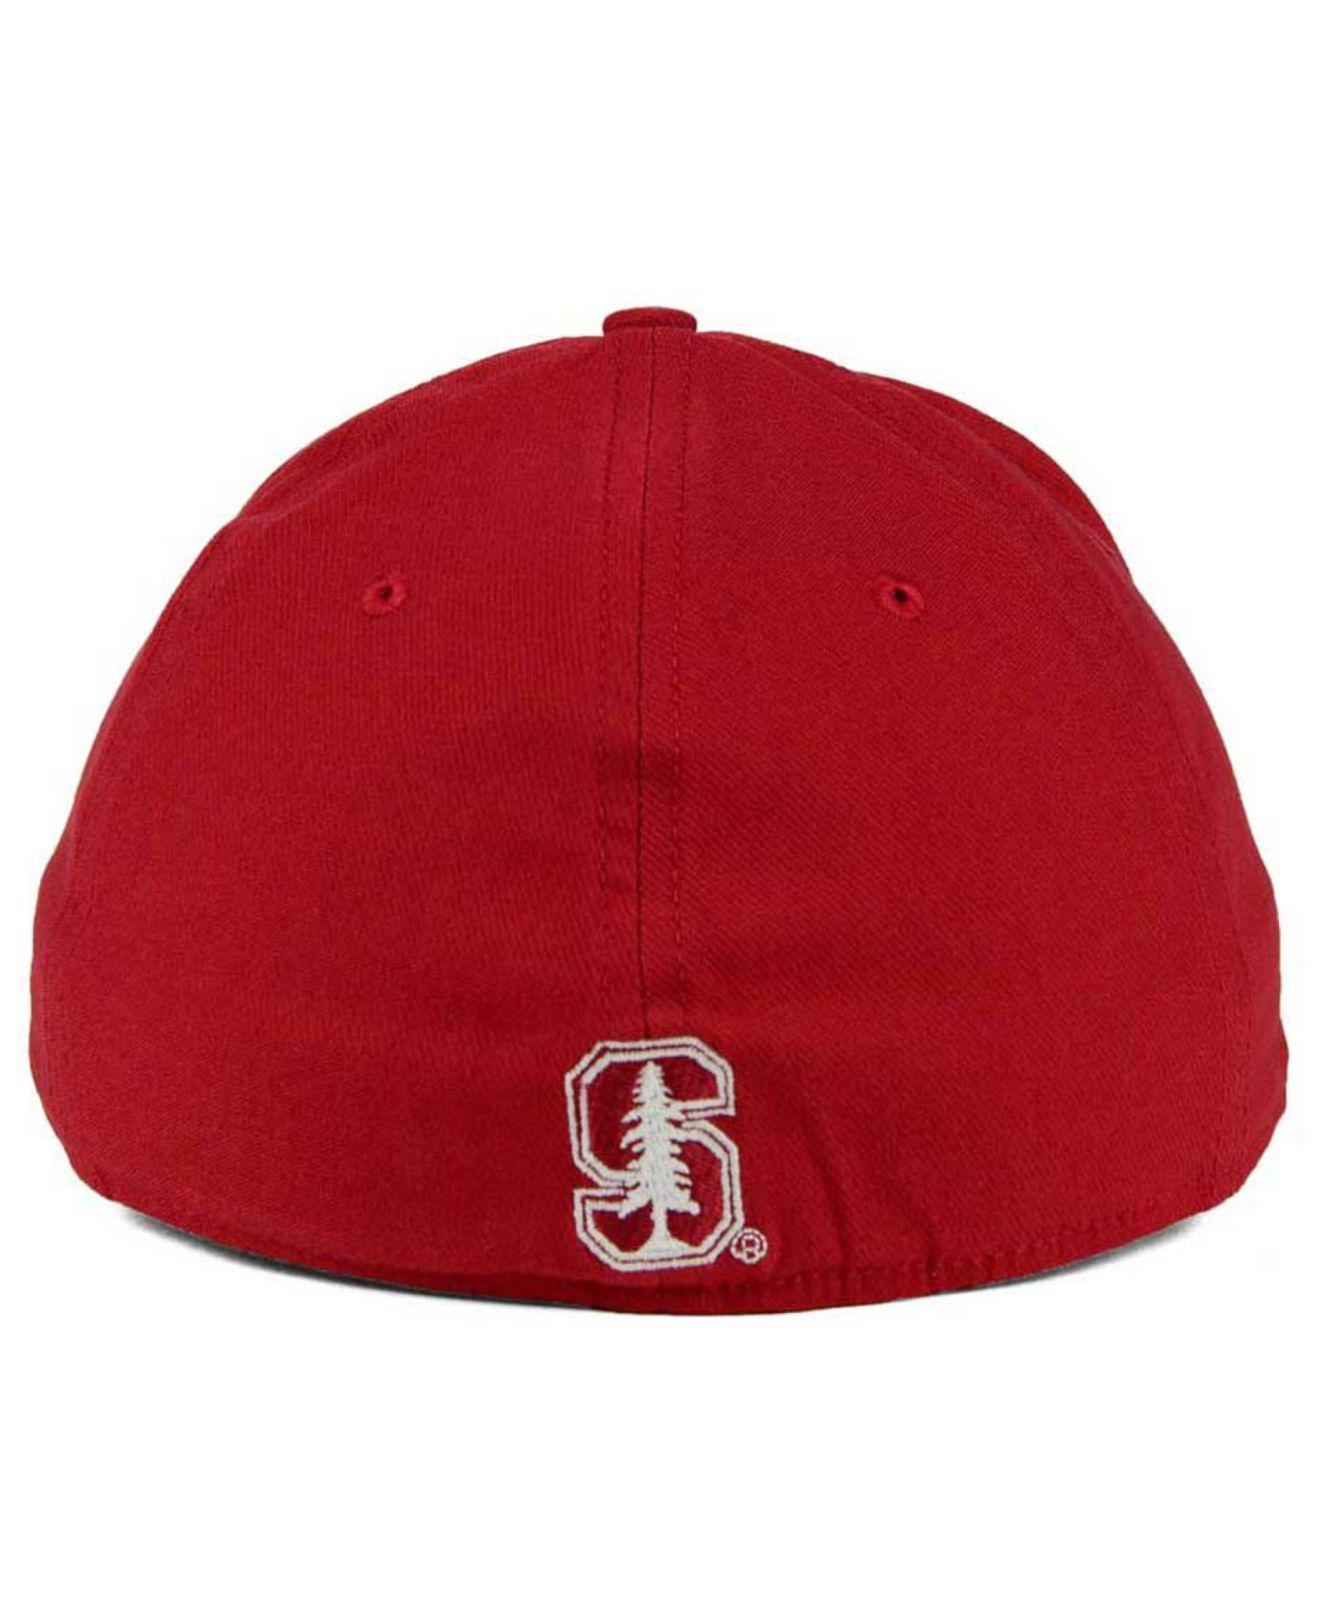 hot sale online f7175 d85c0 Nike - Red Stanford Cardinal Classic Swoosh Cap for Men - Lyst. View  fullscreen